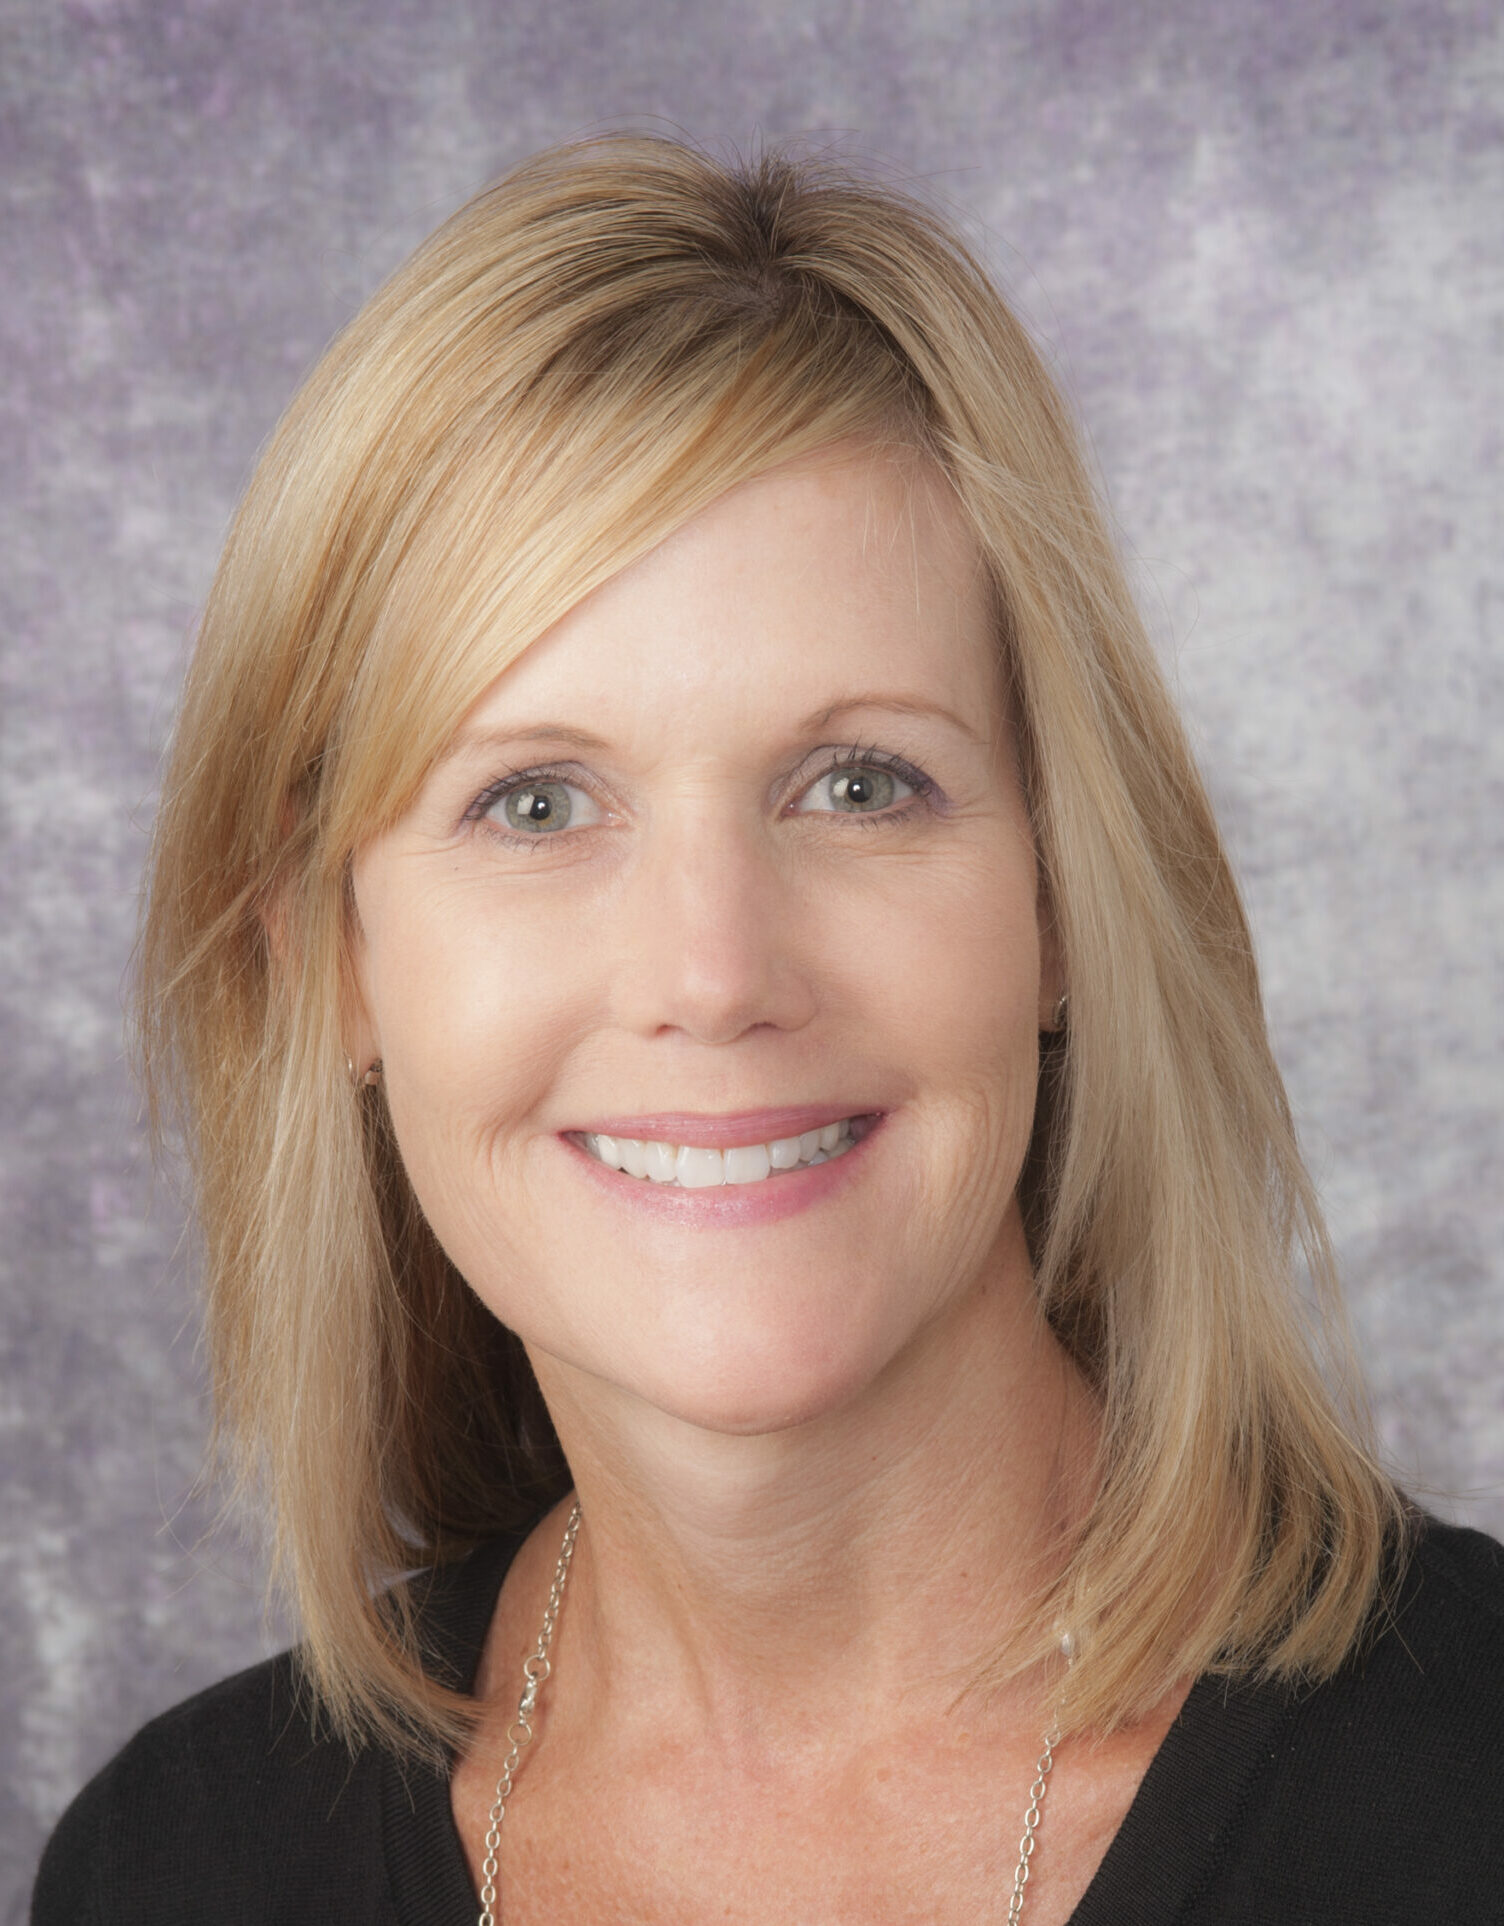 Robin L. Myers MSN, ANP-BC